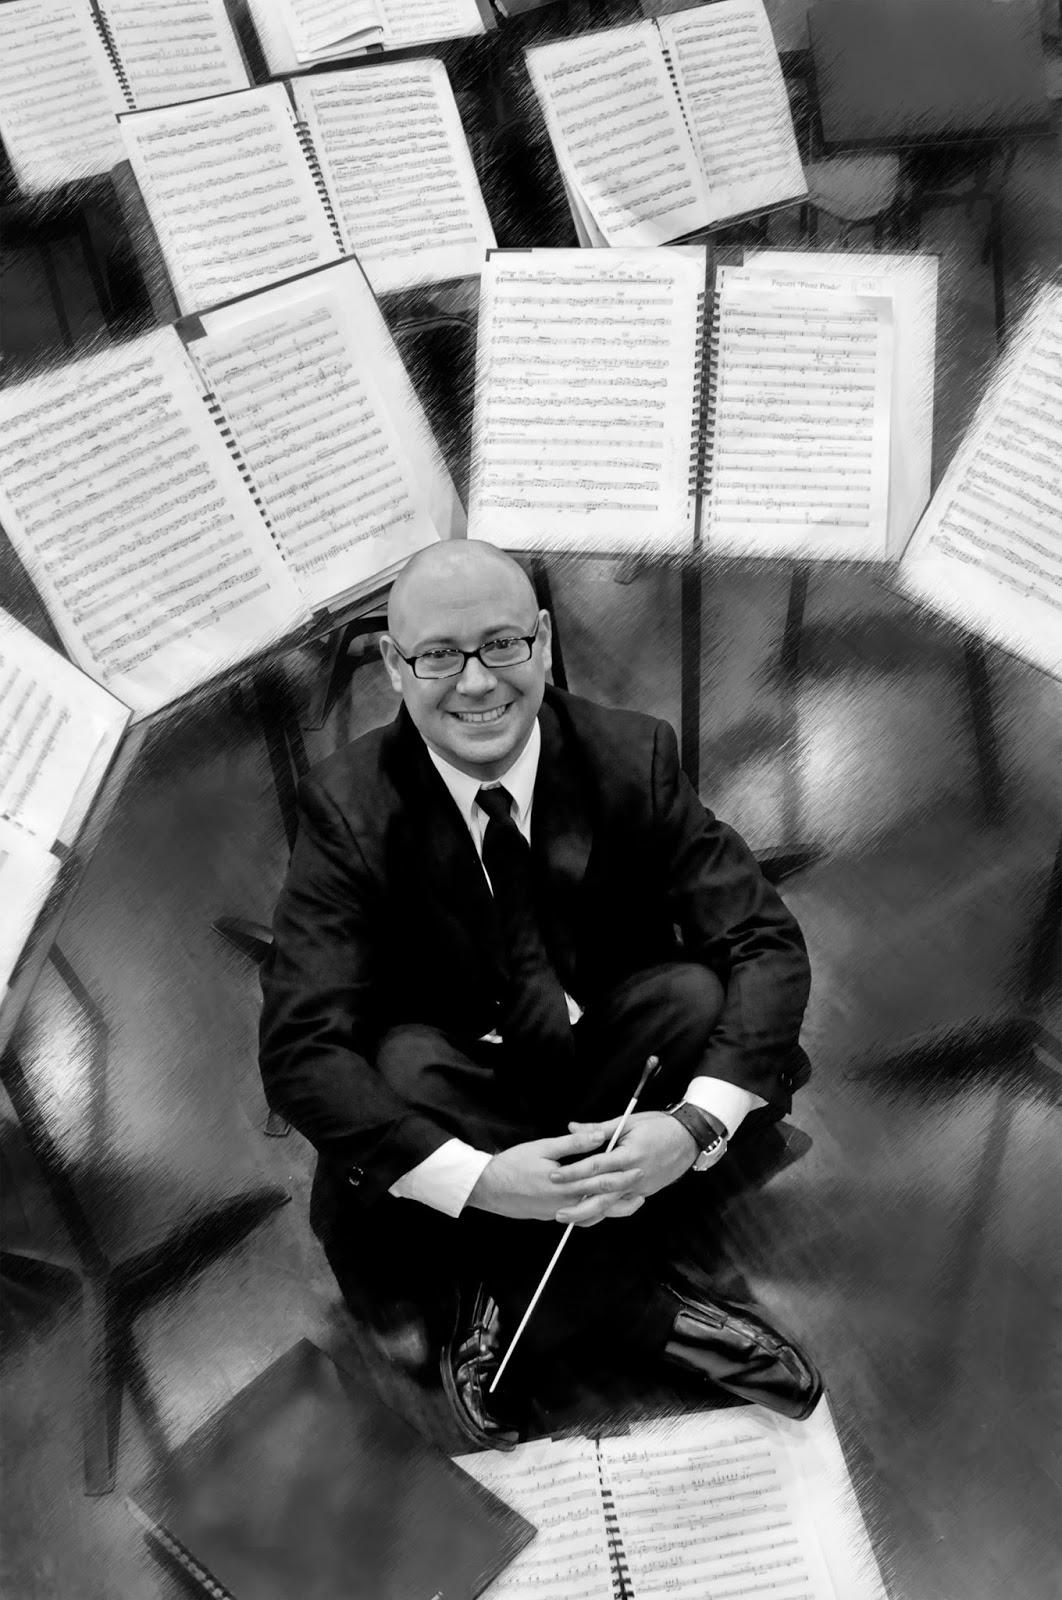 Conservatorio de m sica sim n bol var la orquesta latino for Conservatorio simon bolivar blog